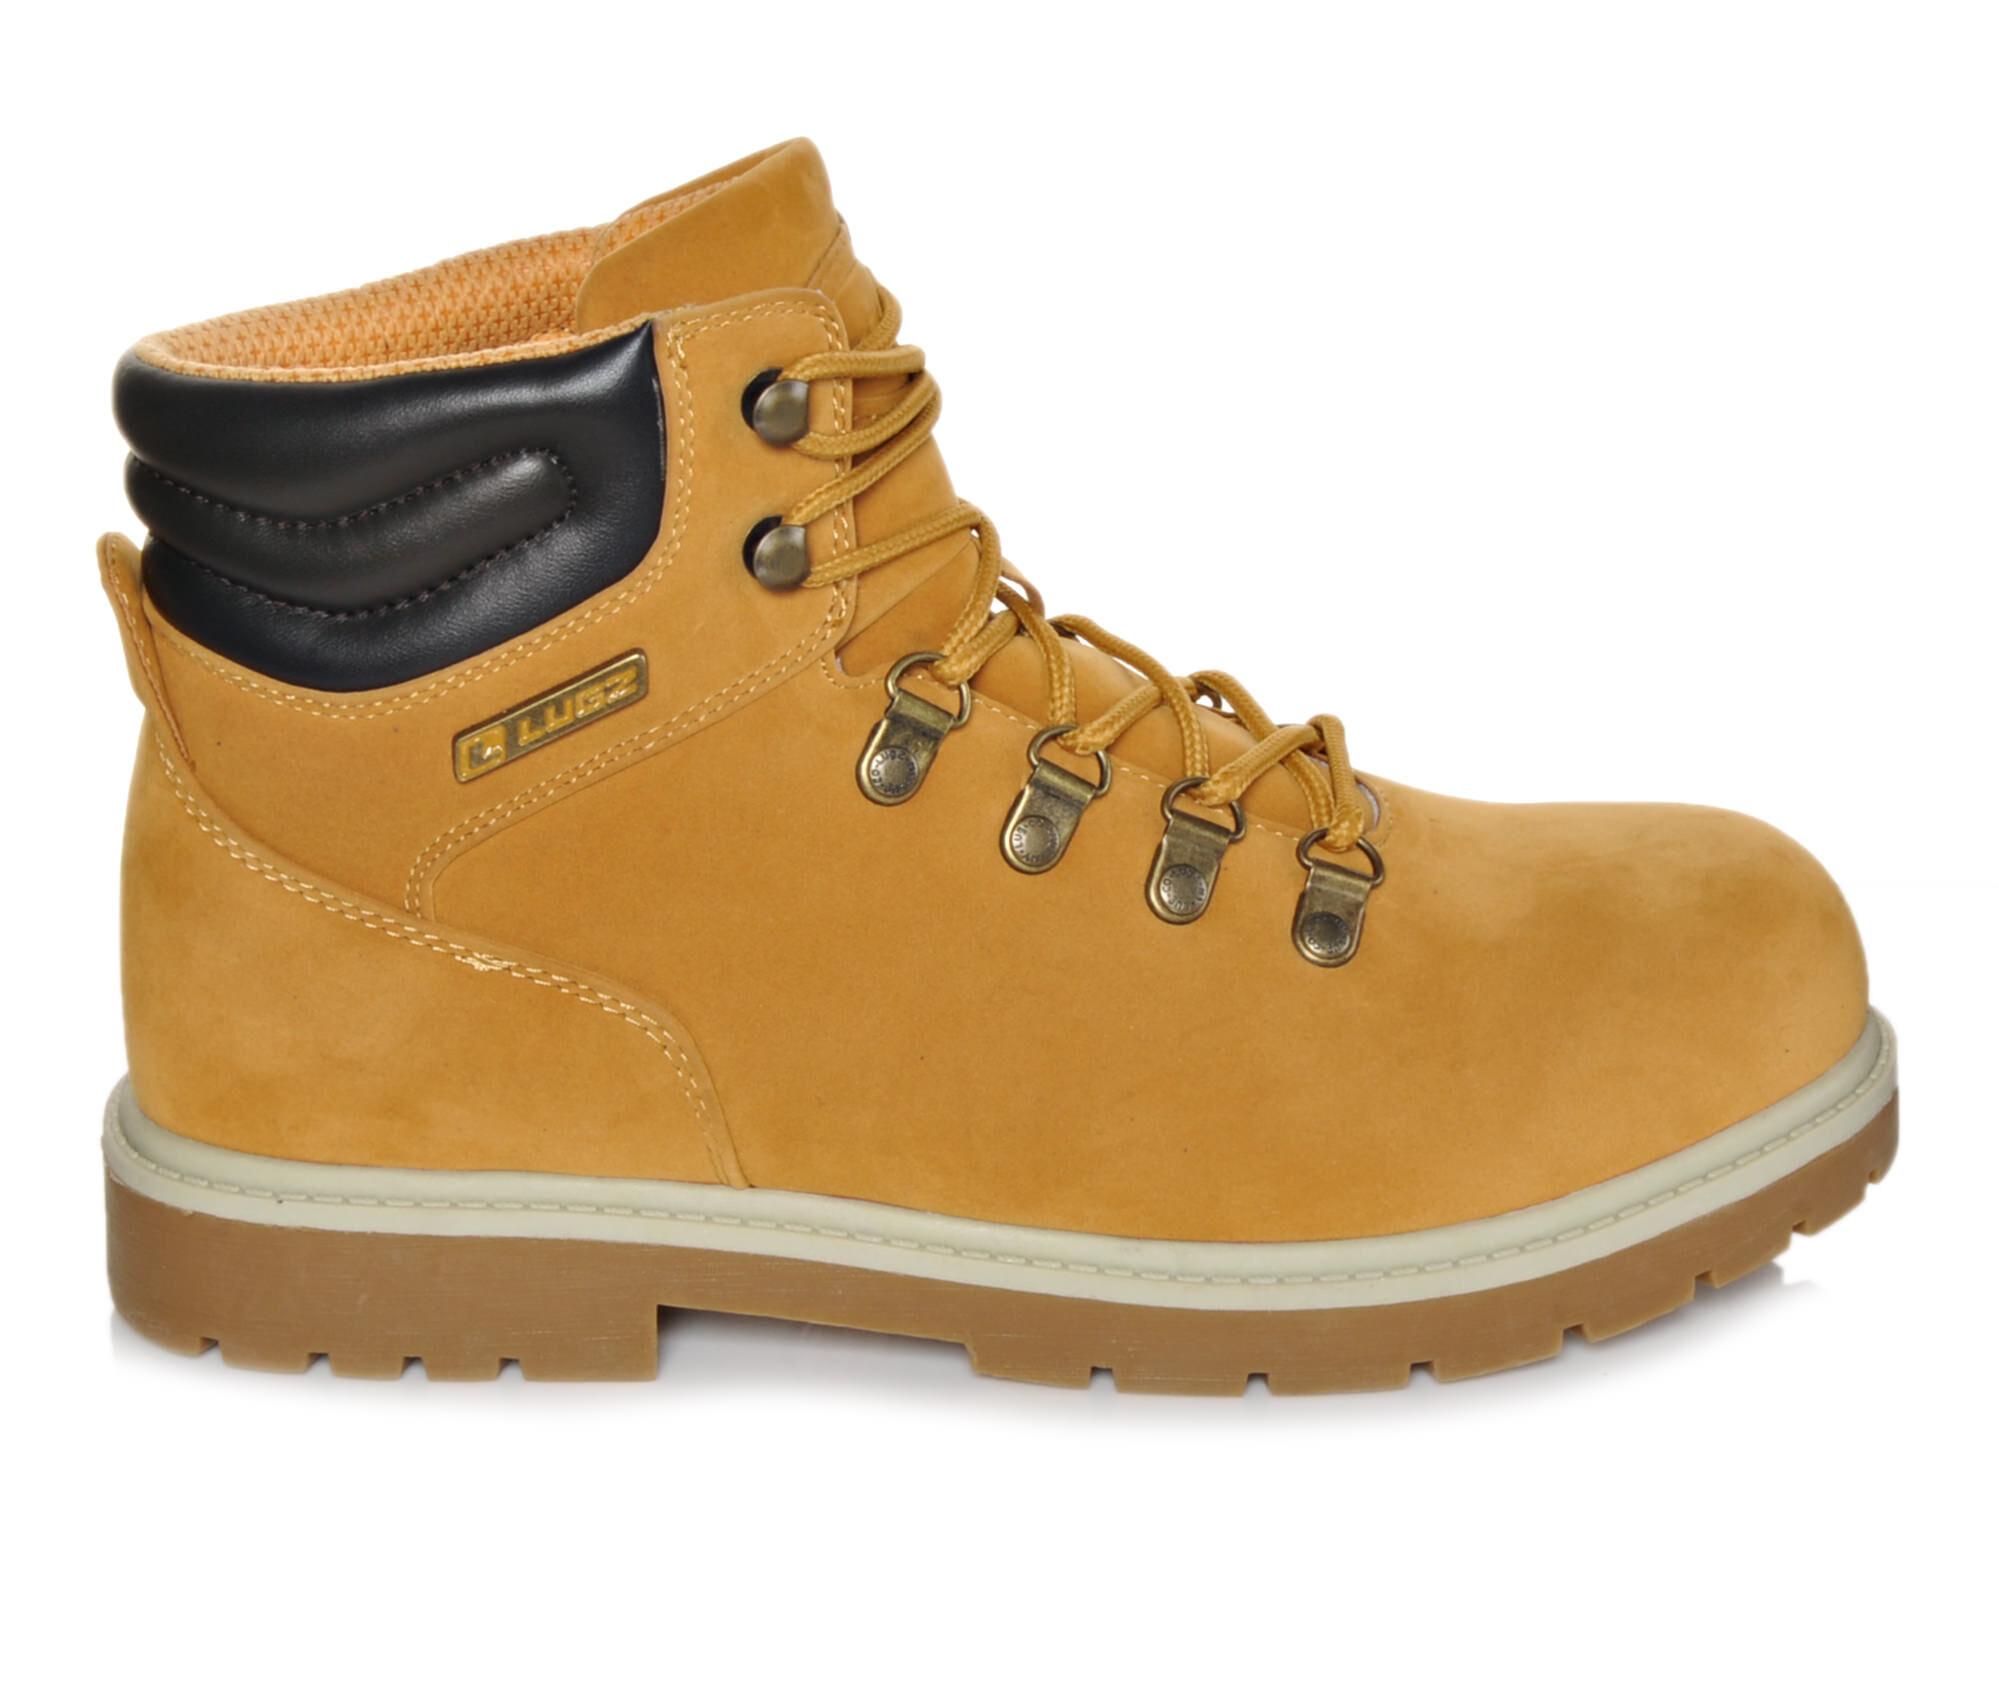 Lugz Grotto Boots sJ9ibEz